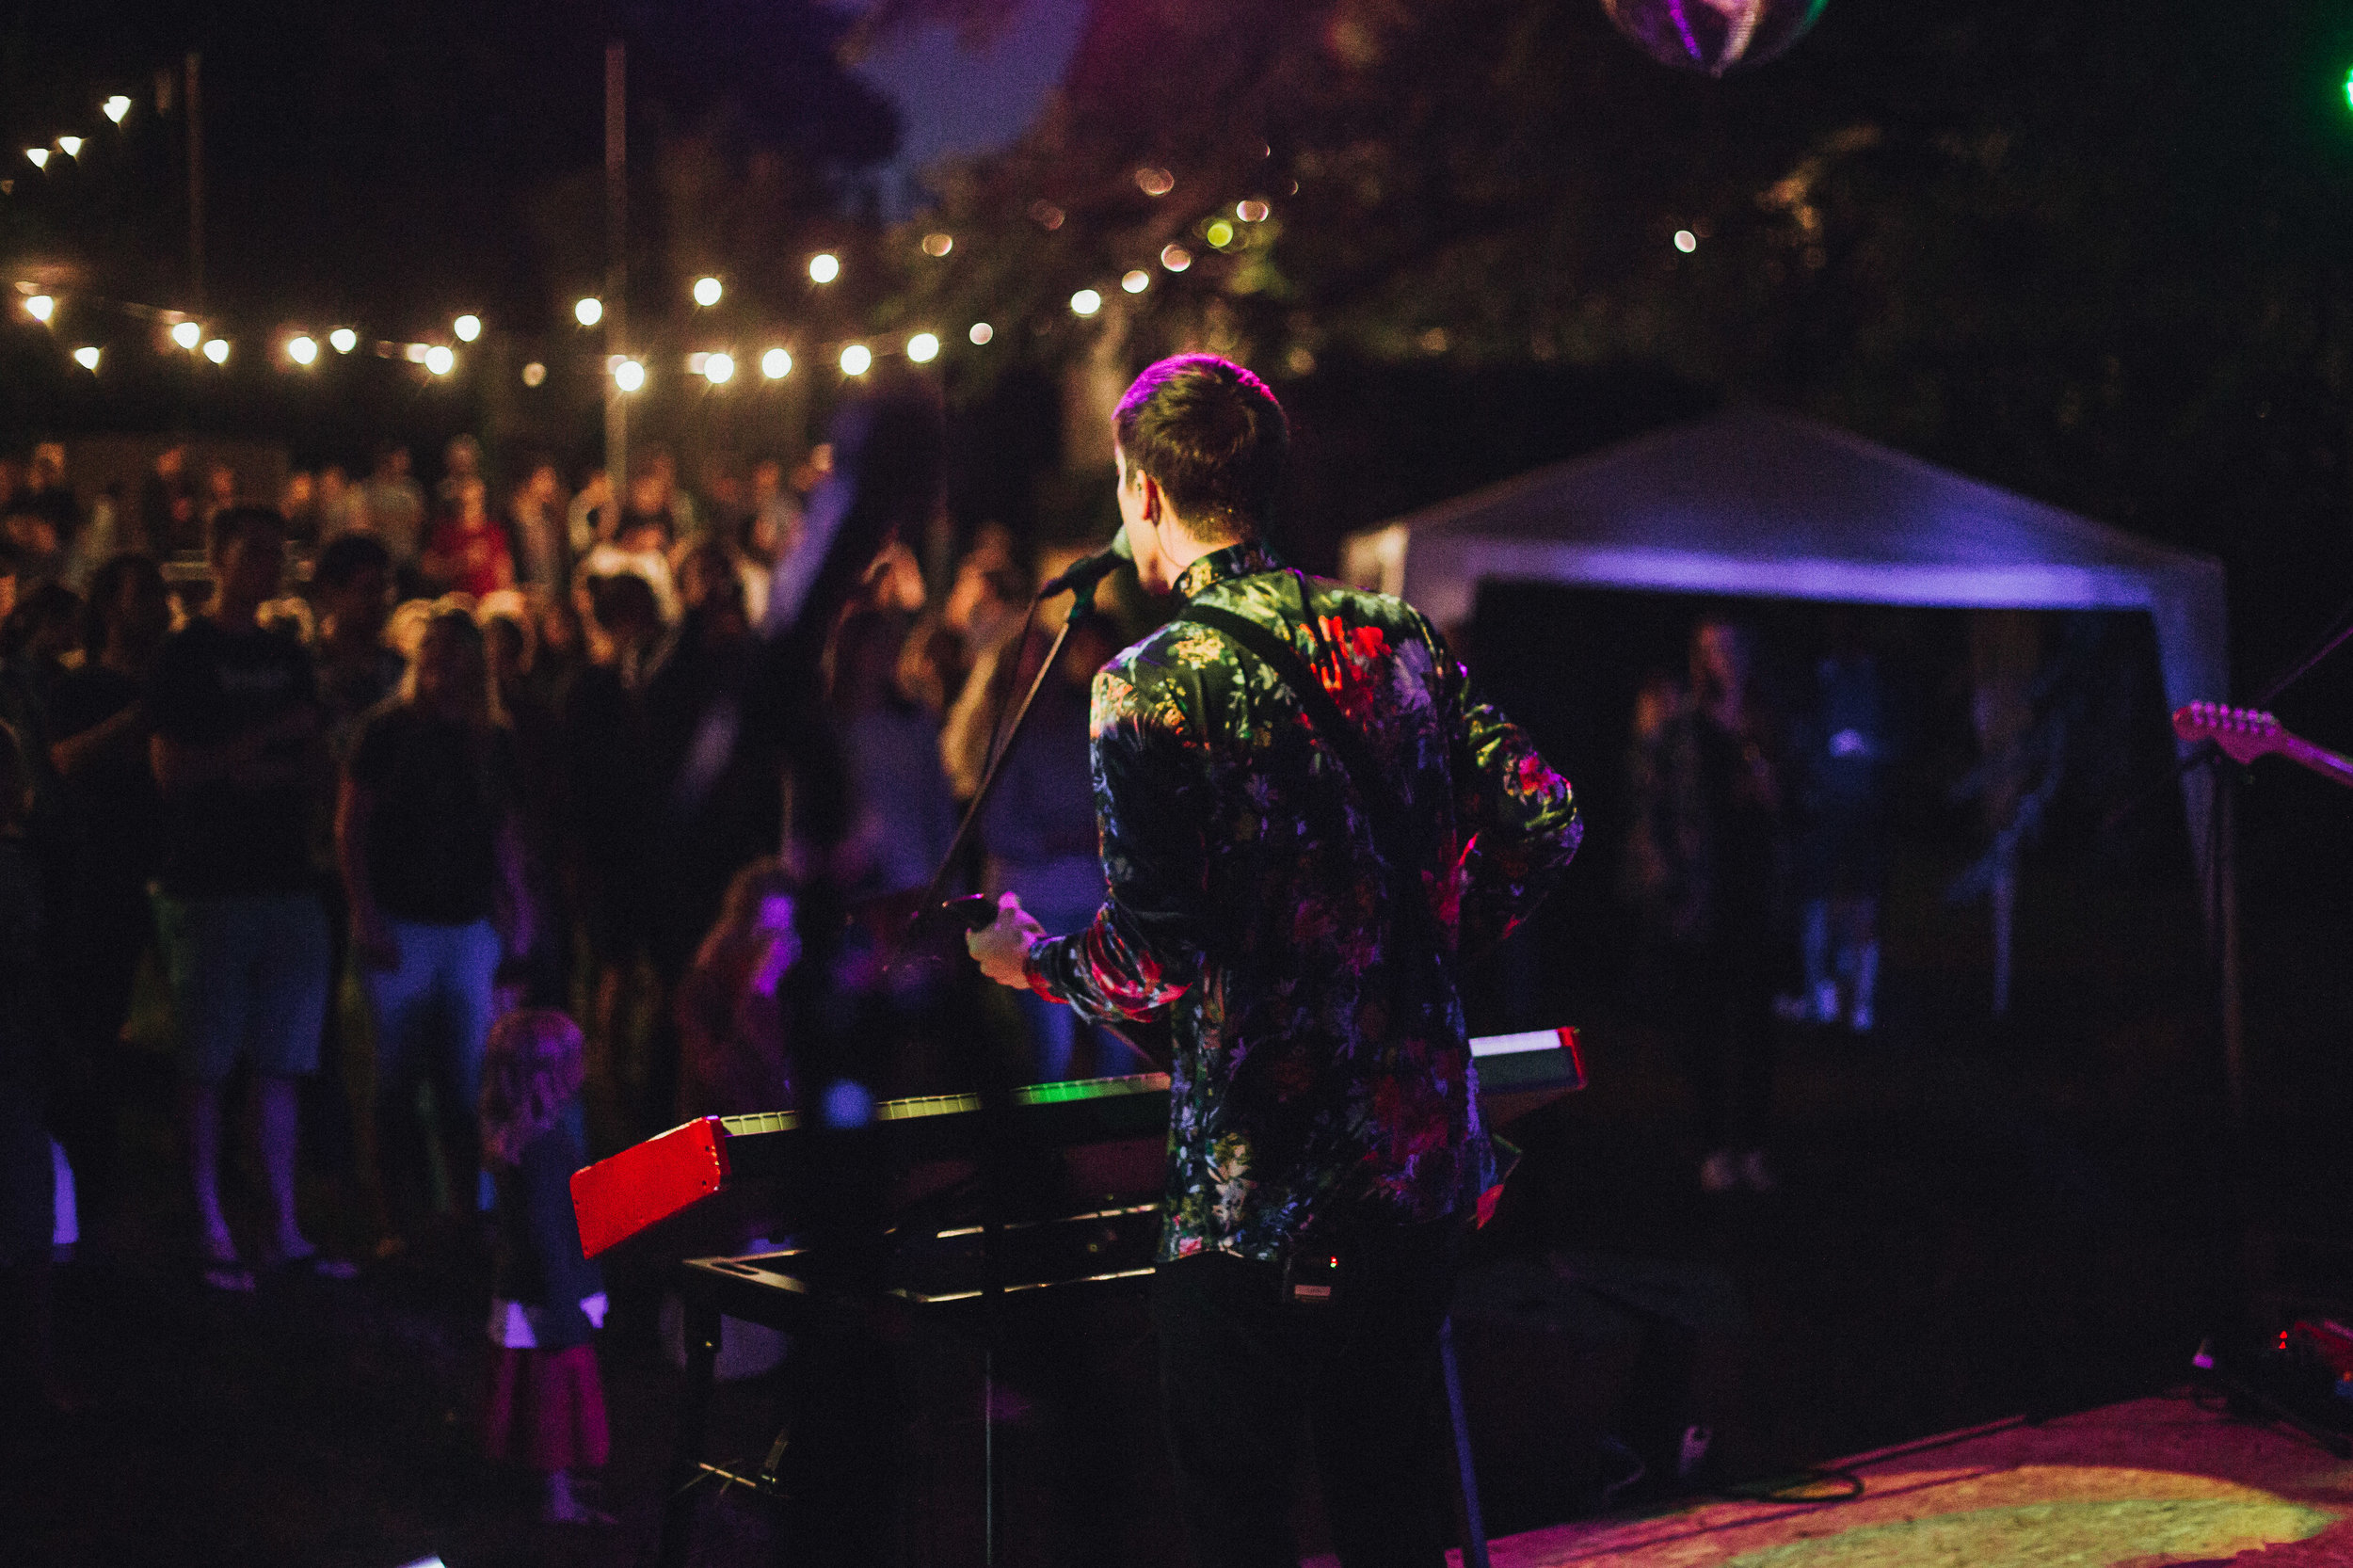 Acts 2018 - DANAAdam's WeddingHOT LIKE SUSHIThe One Singers'sBuena Vista Capital Club TURNDJ Cruze & DJ Plassix